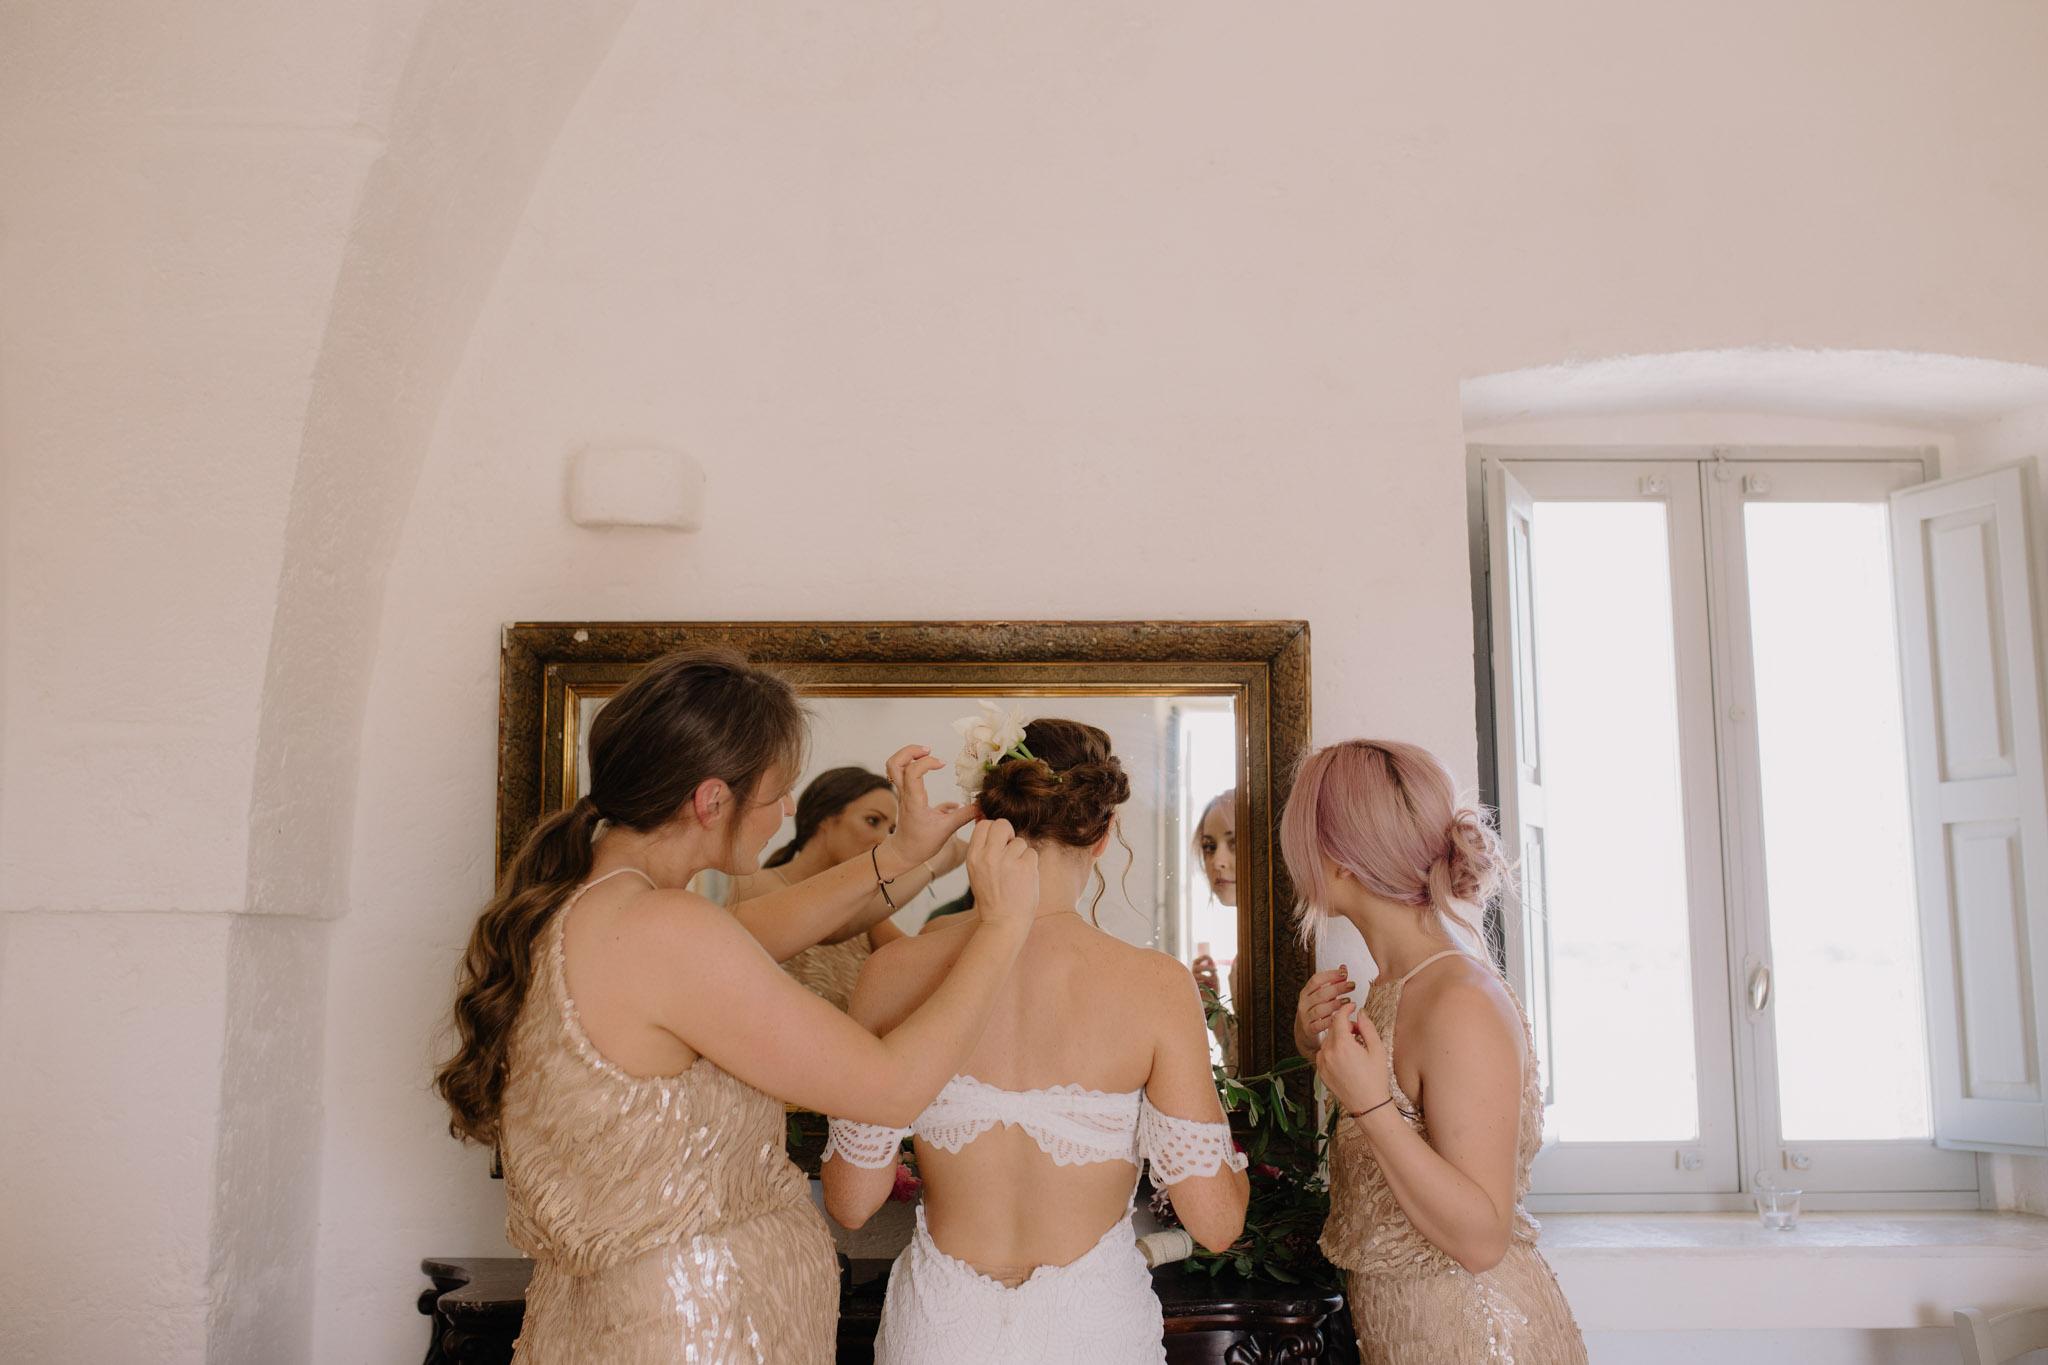 Puglia Wedding Photographer Masseria Potenti Apulian wedding Grace Loves Lace Bride BHLDN Bridesmaids dress